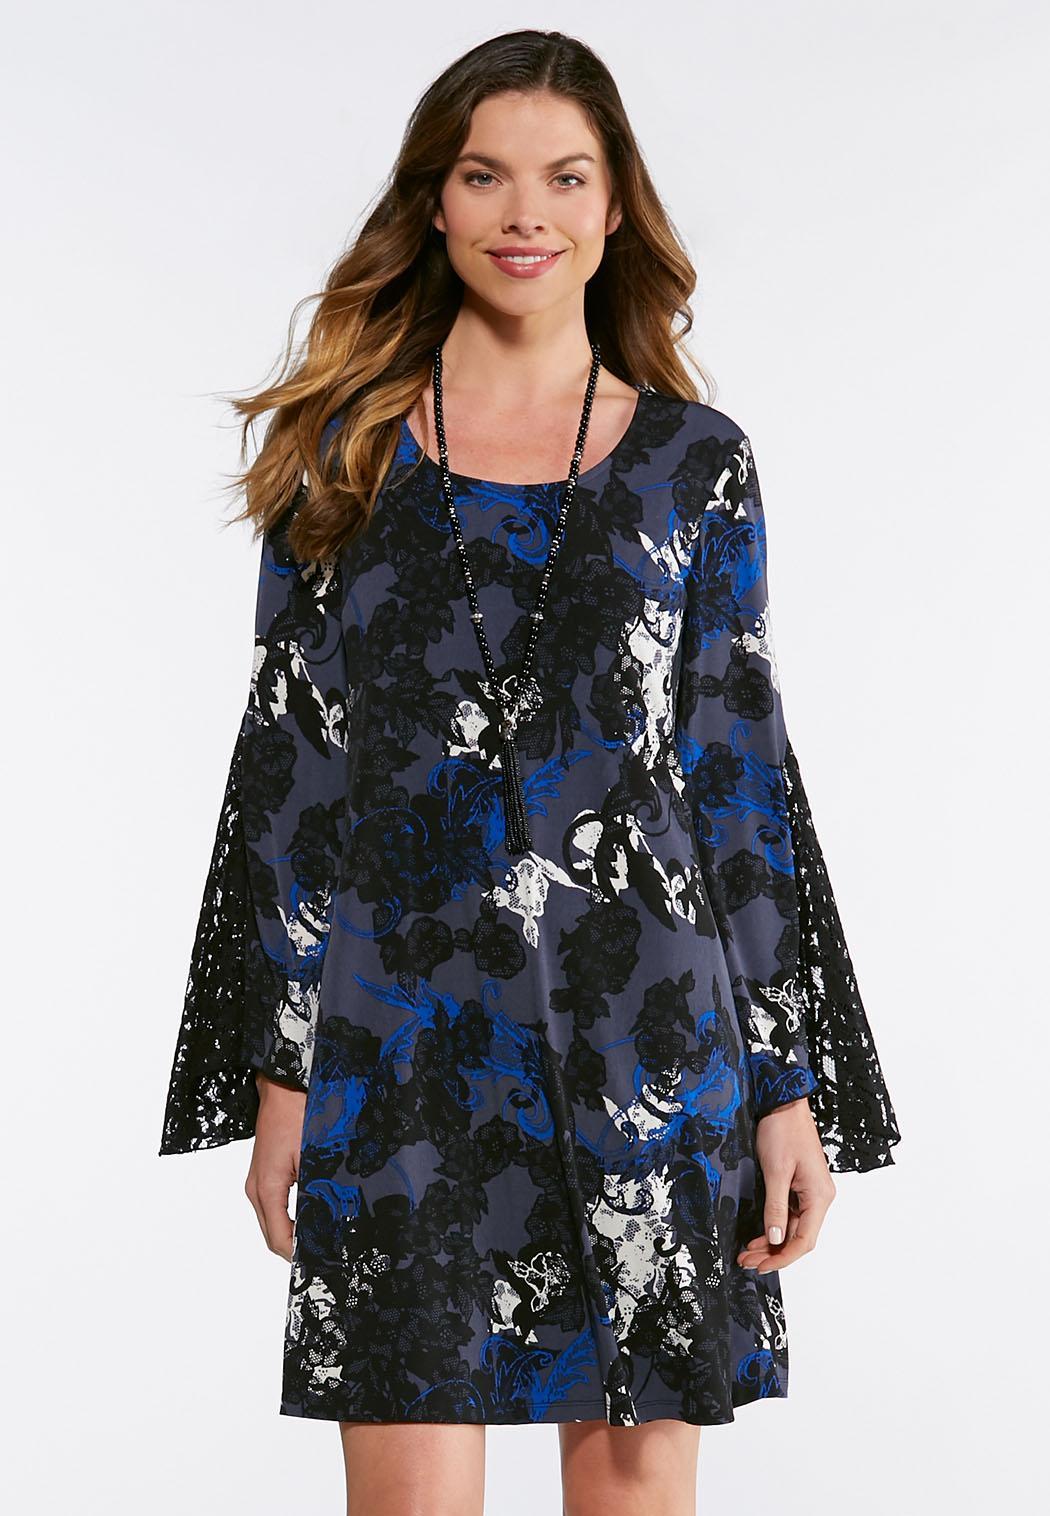 Blue Lace Sleeve Swing Dress A-line   Swing Cato Fashions f701d0e2d